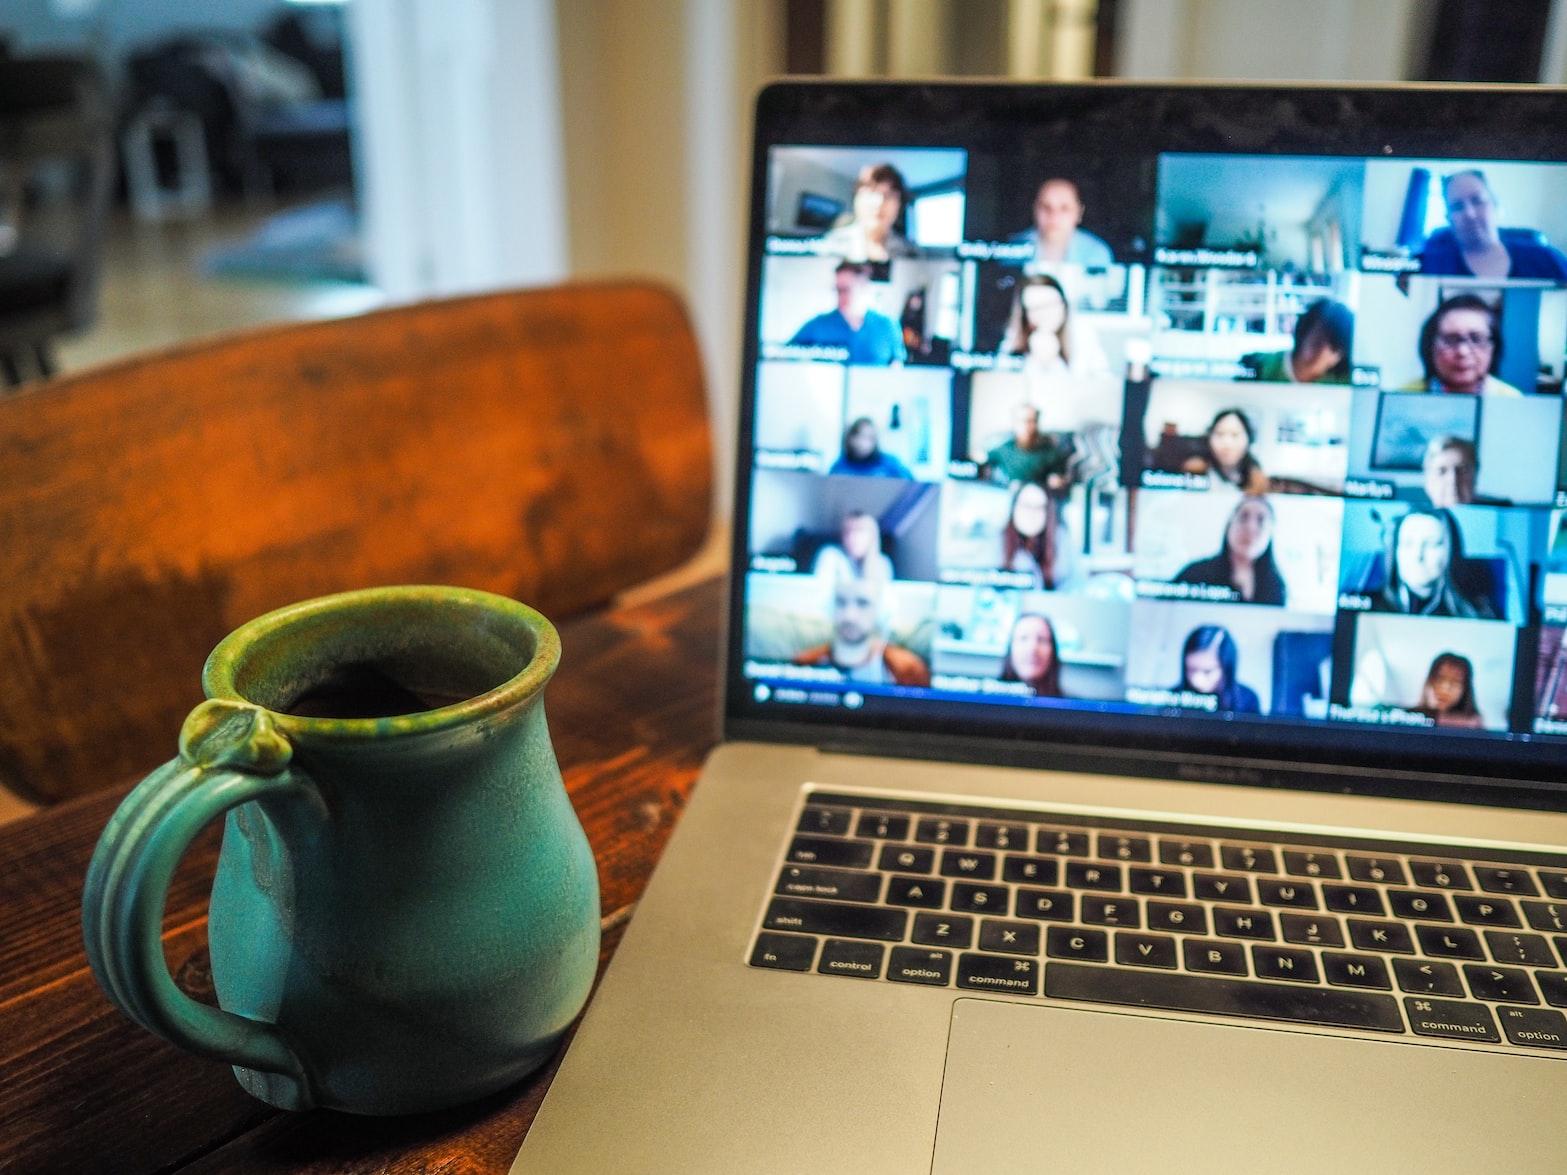 Online Experiences | Yoga, wellness, meditation classes | Daily Classes